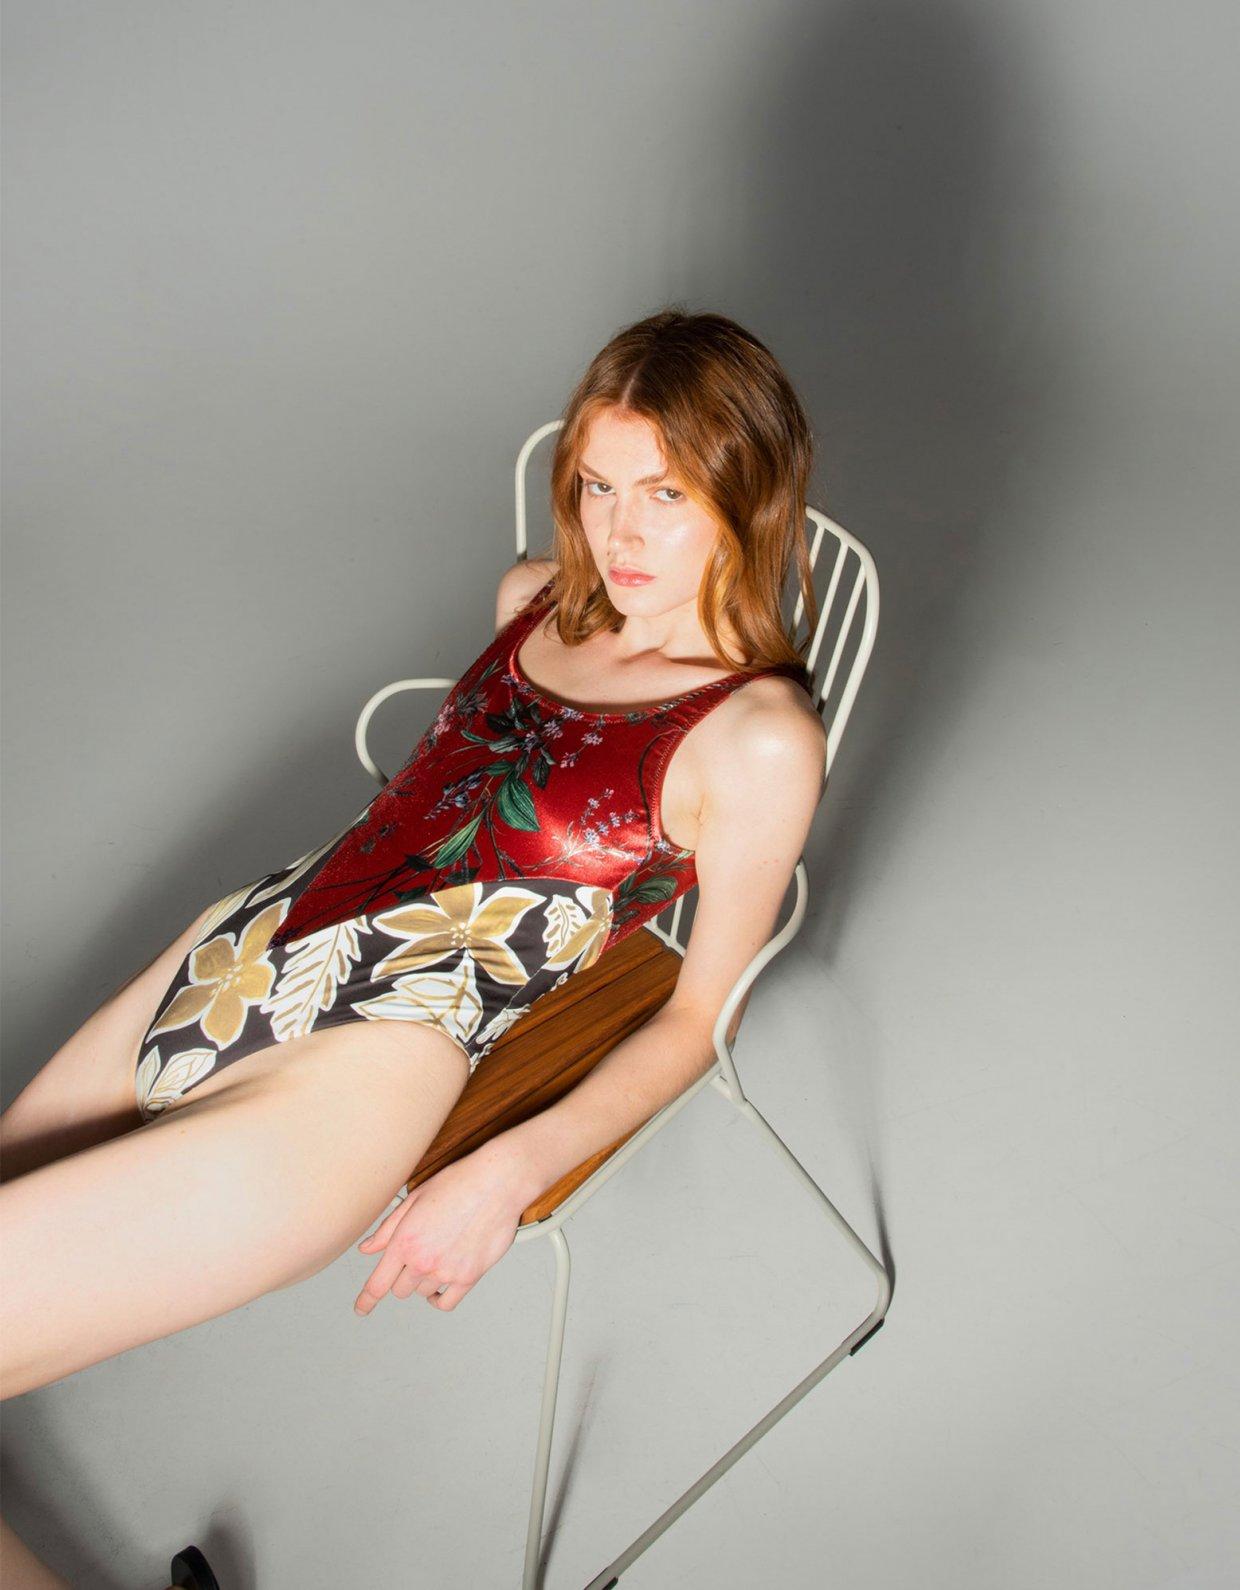 Nadia Rapti Twilight swimsuit